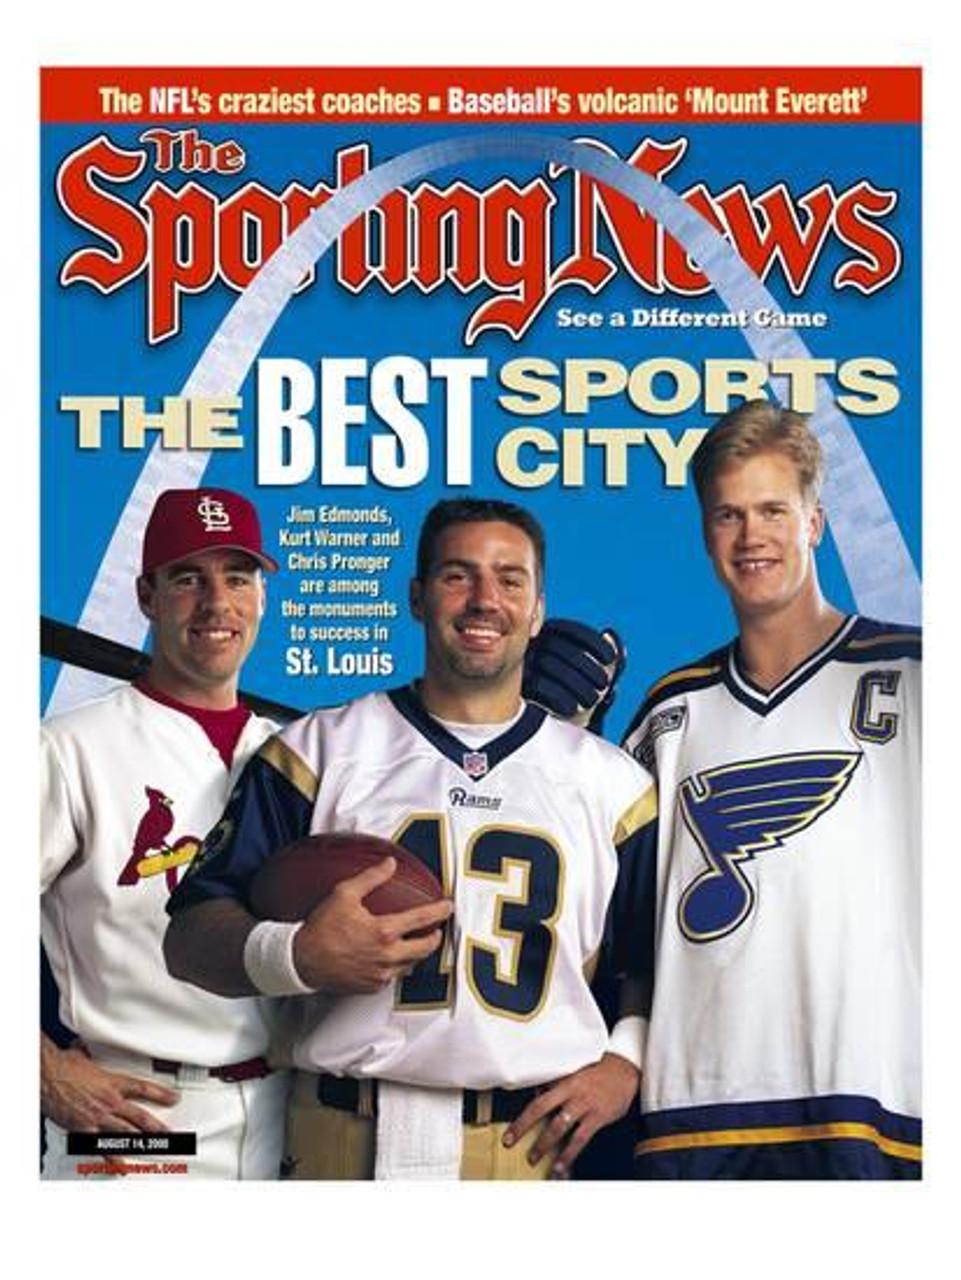 best service 9a195 c318f St Louis Best Sports City Sporting News Cover Unframed Reproduction  featuring Jim Edmonds Kurt Warner and Chris Pronger